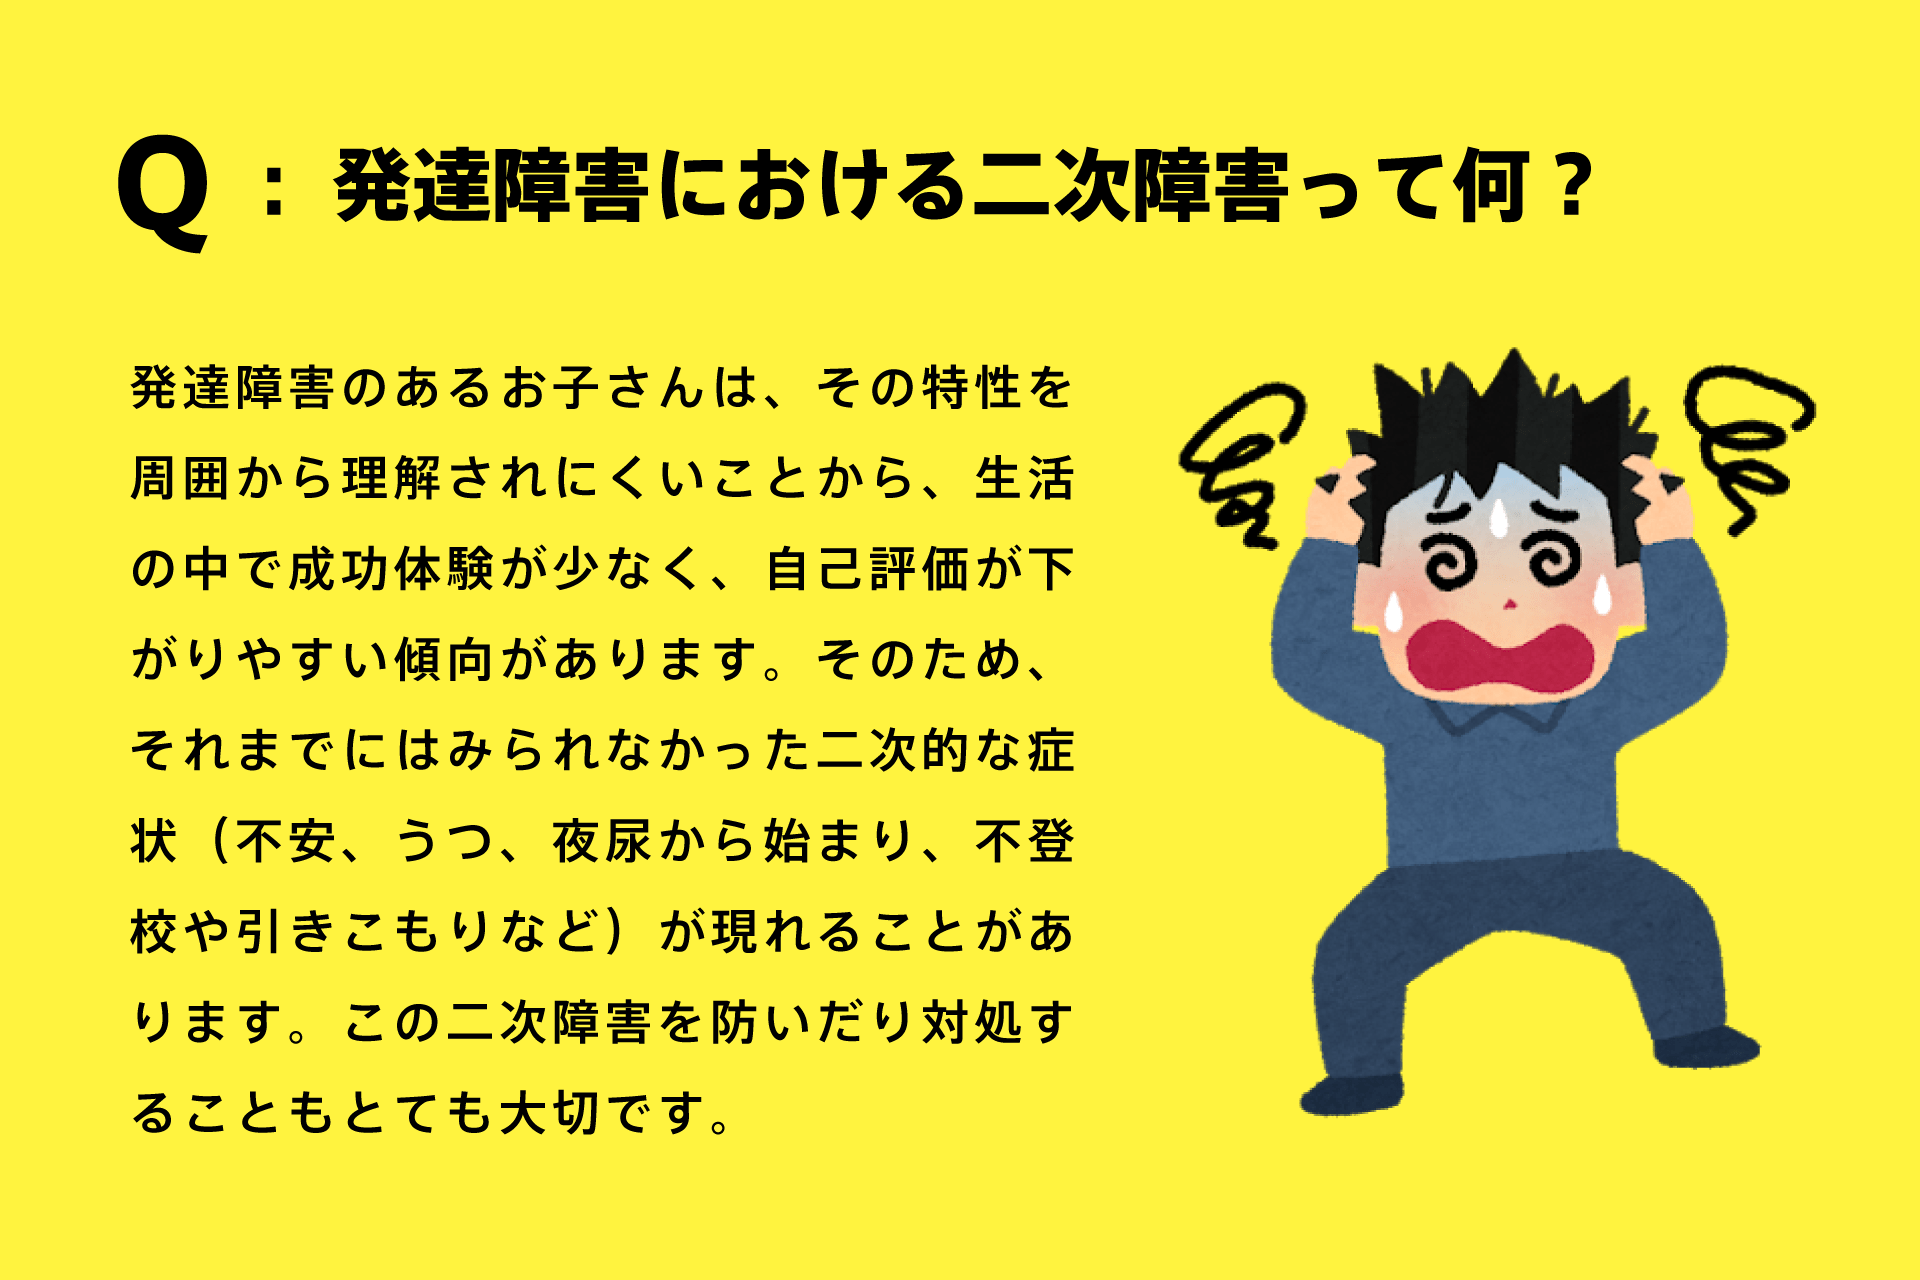 Q:発達障害における二次障害って何?